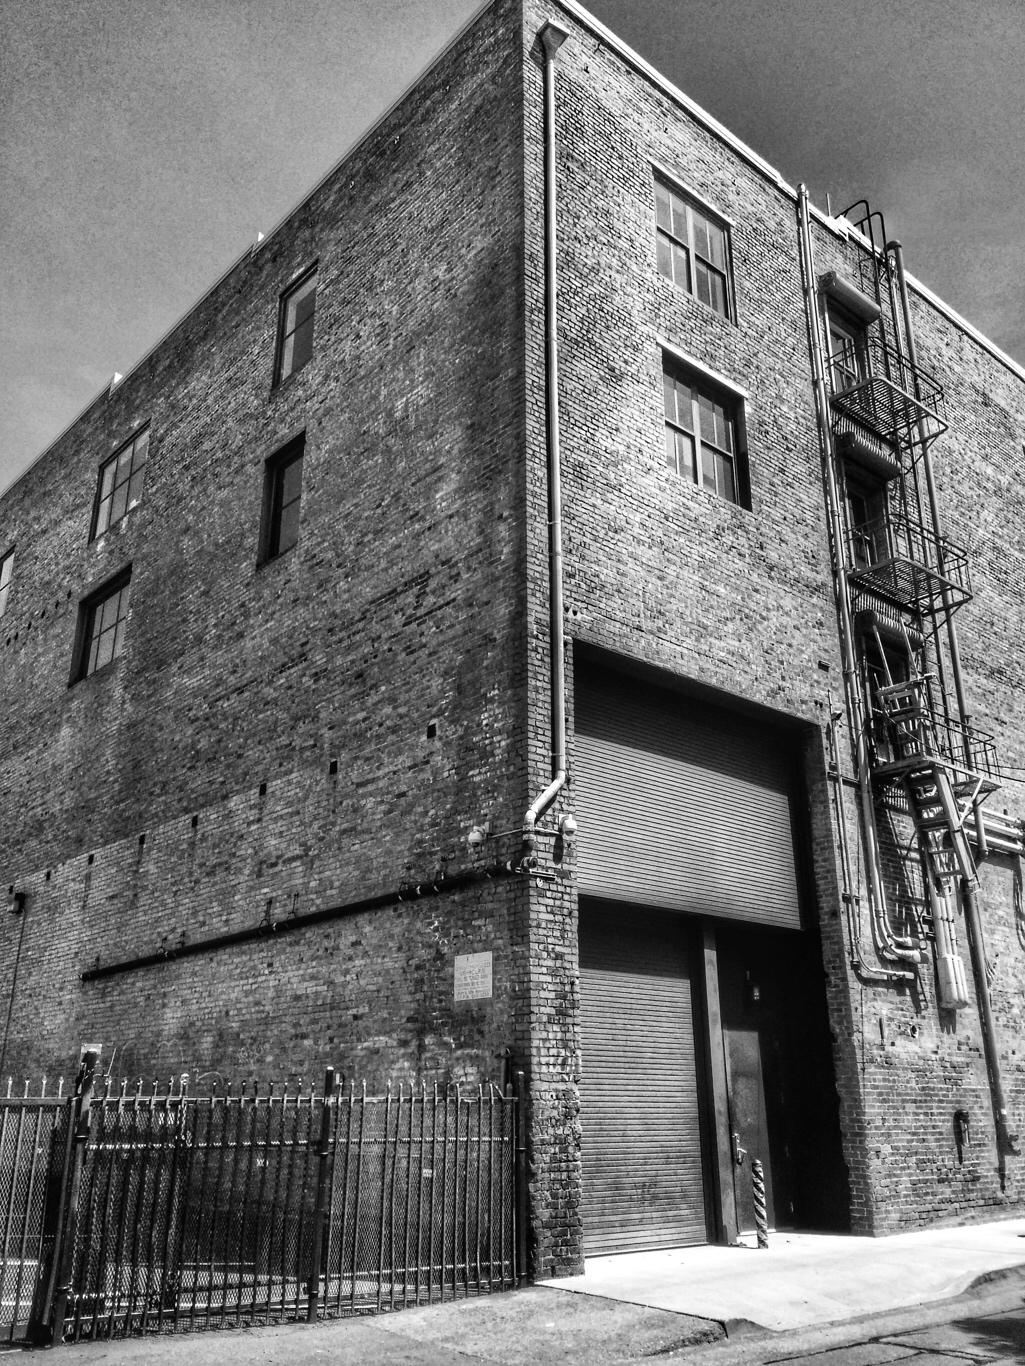 San Francisco noir. 2017 1928 - architecture - voiceofsf | ello